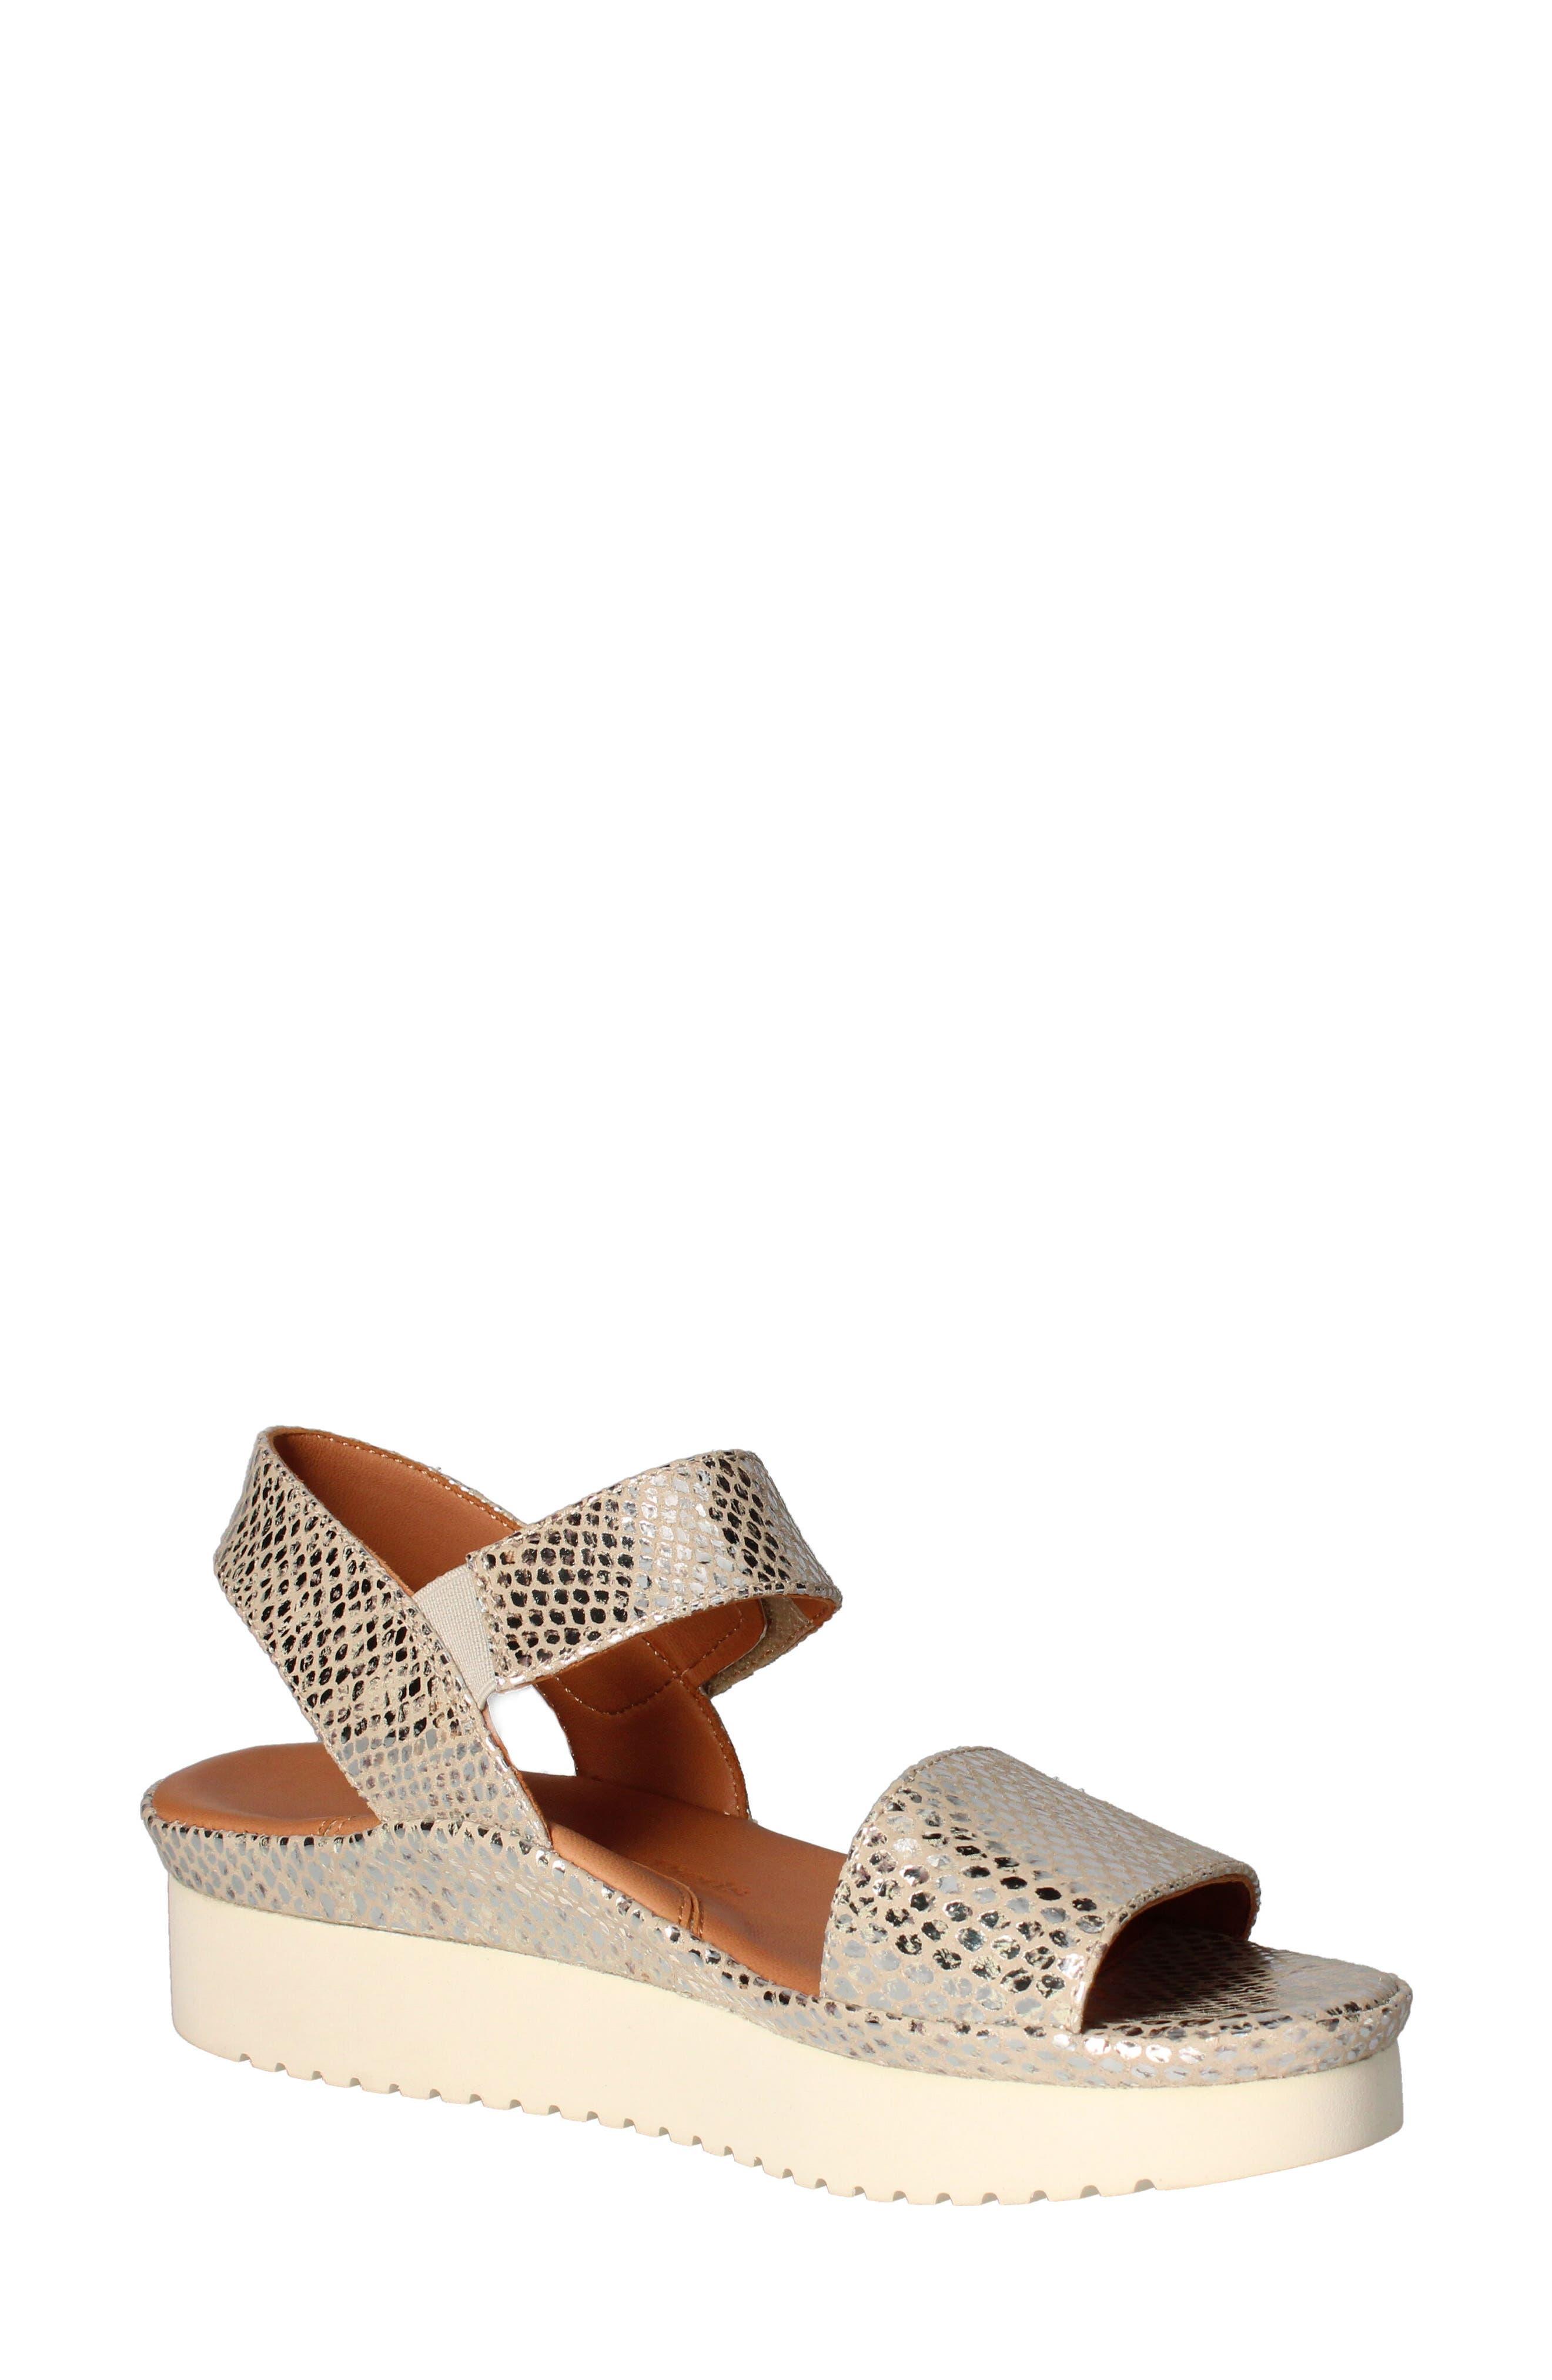 Abrilla Platform Sandal